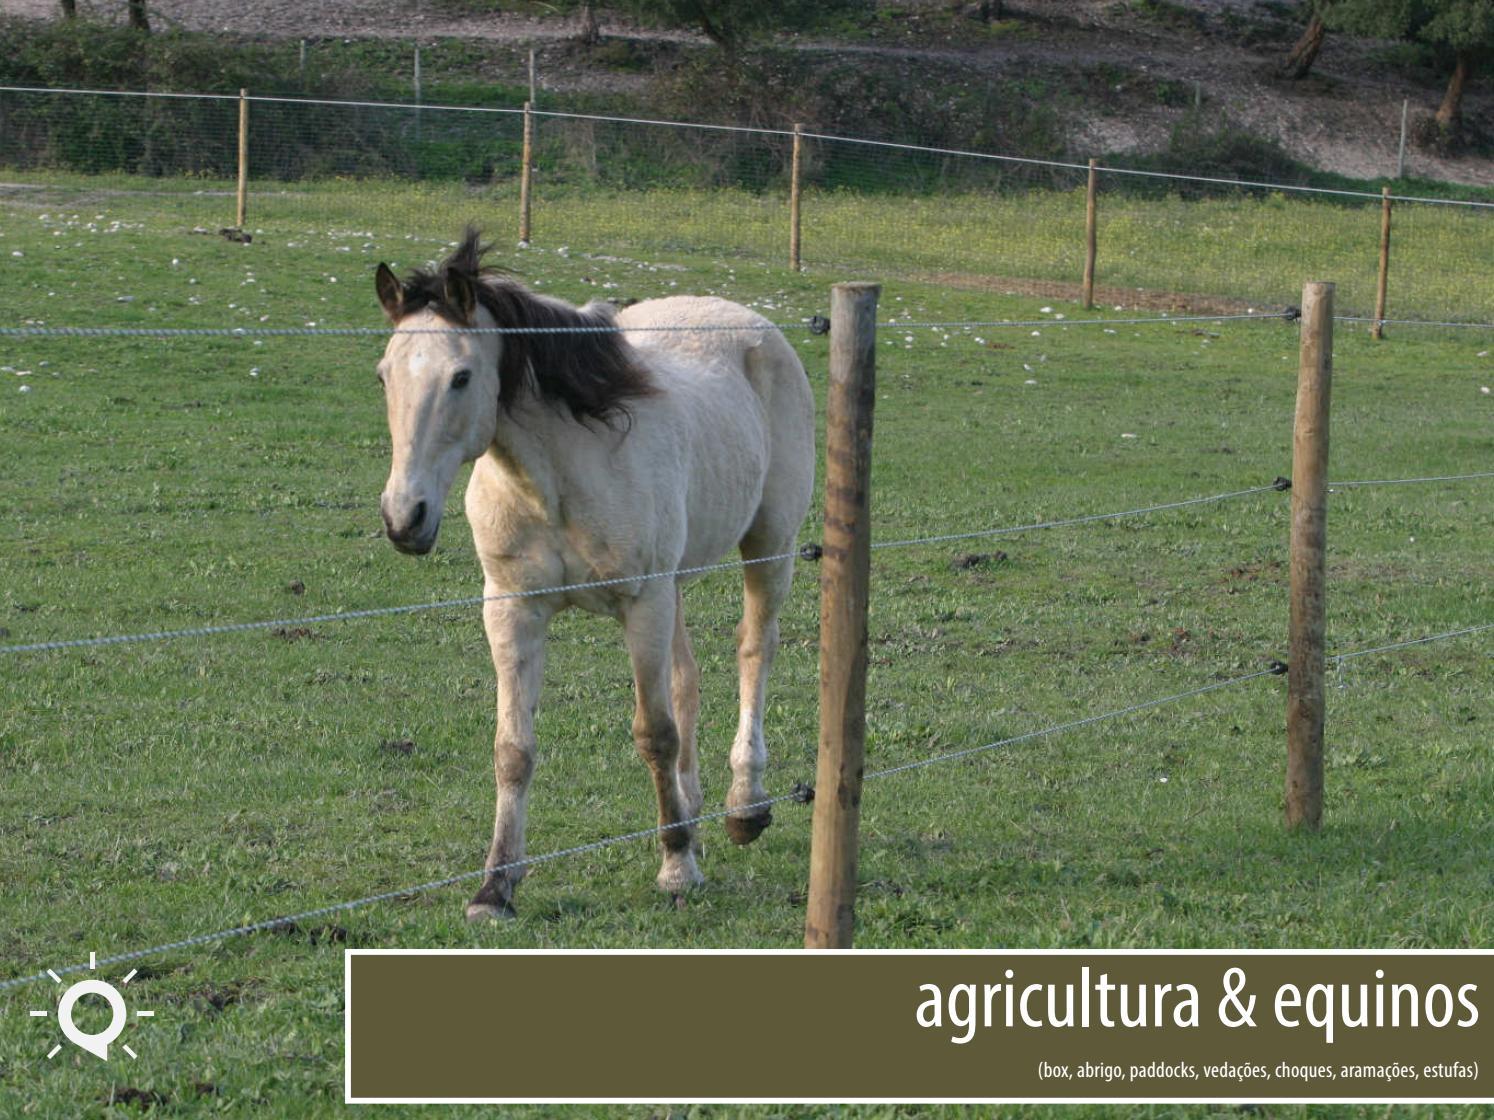 Equinos & Agricultura